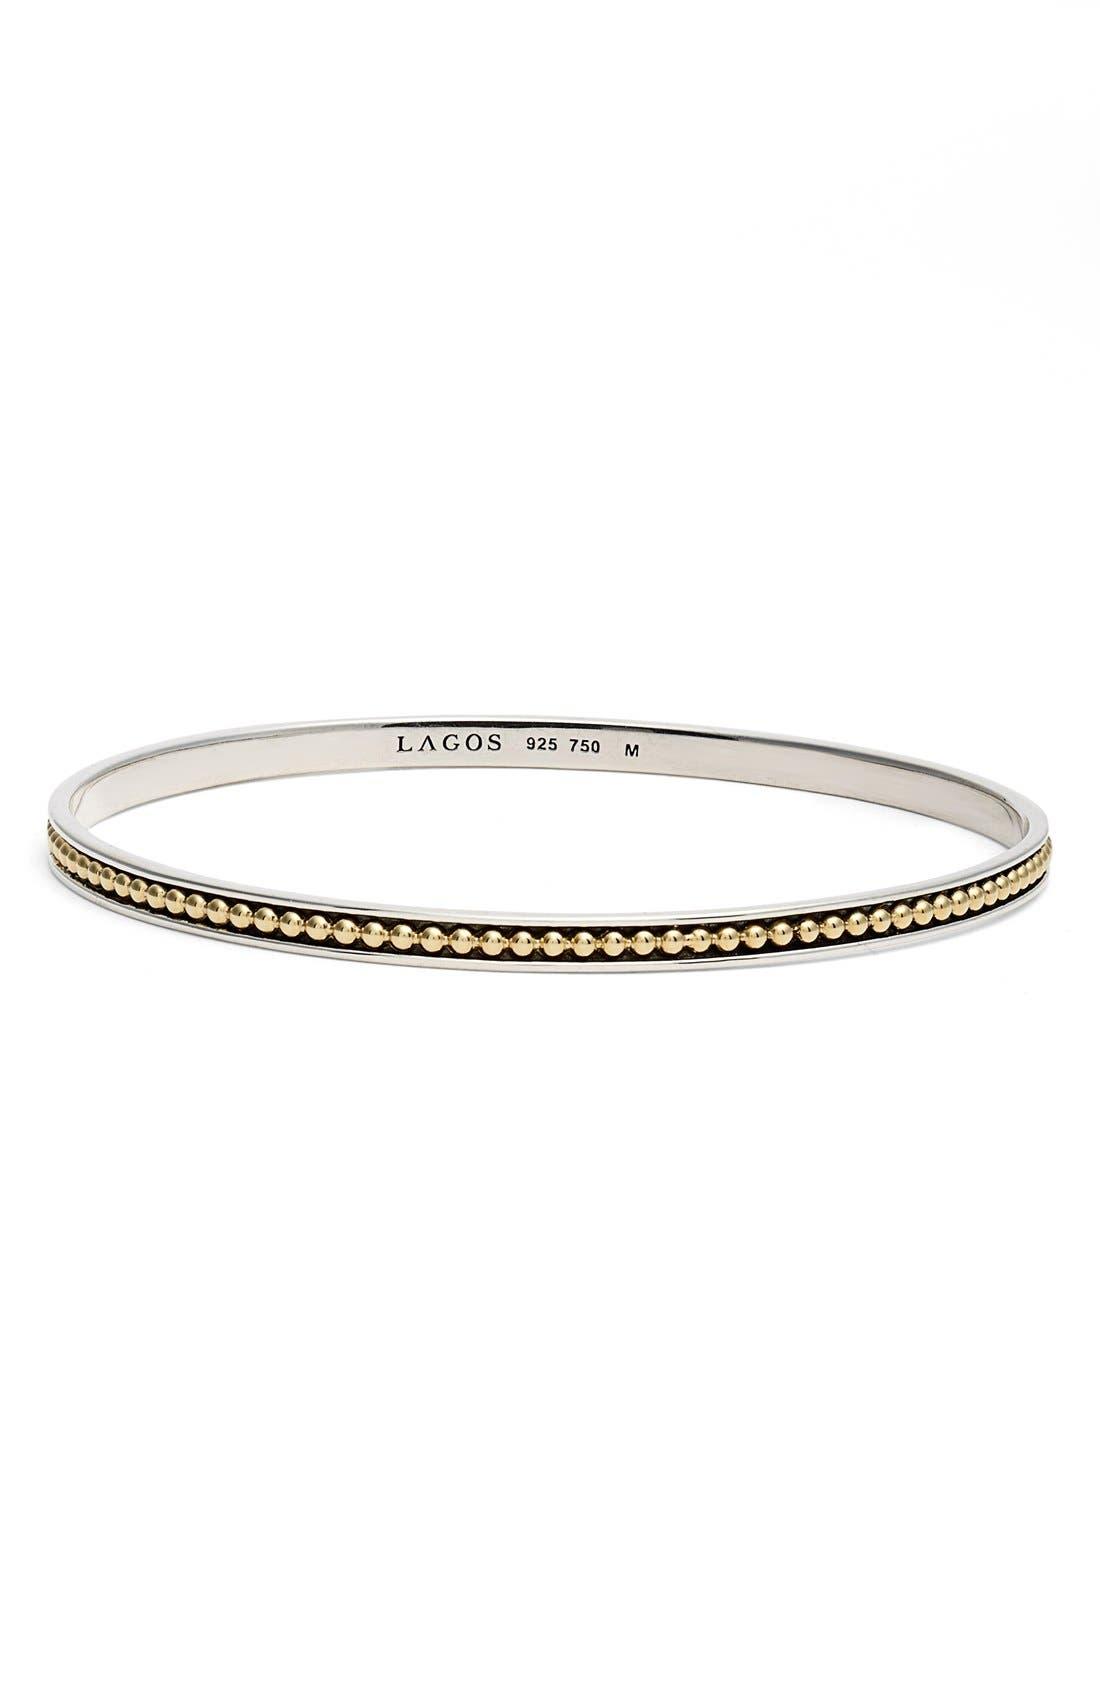 'Enso' Caviar Bangle,                         Main,                         color, Silver/ Gold